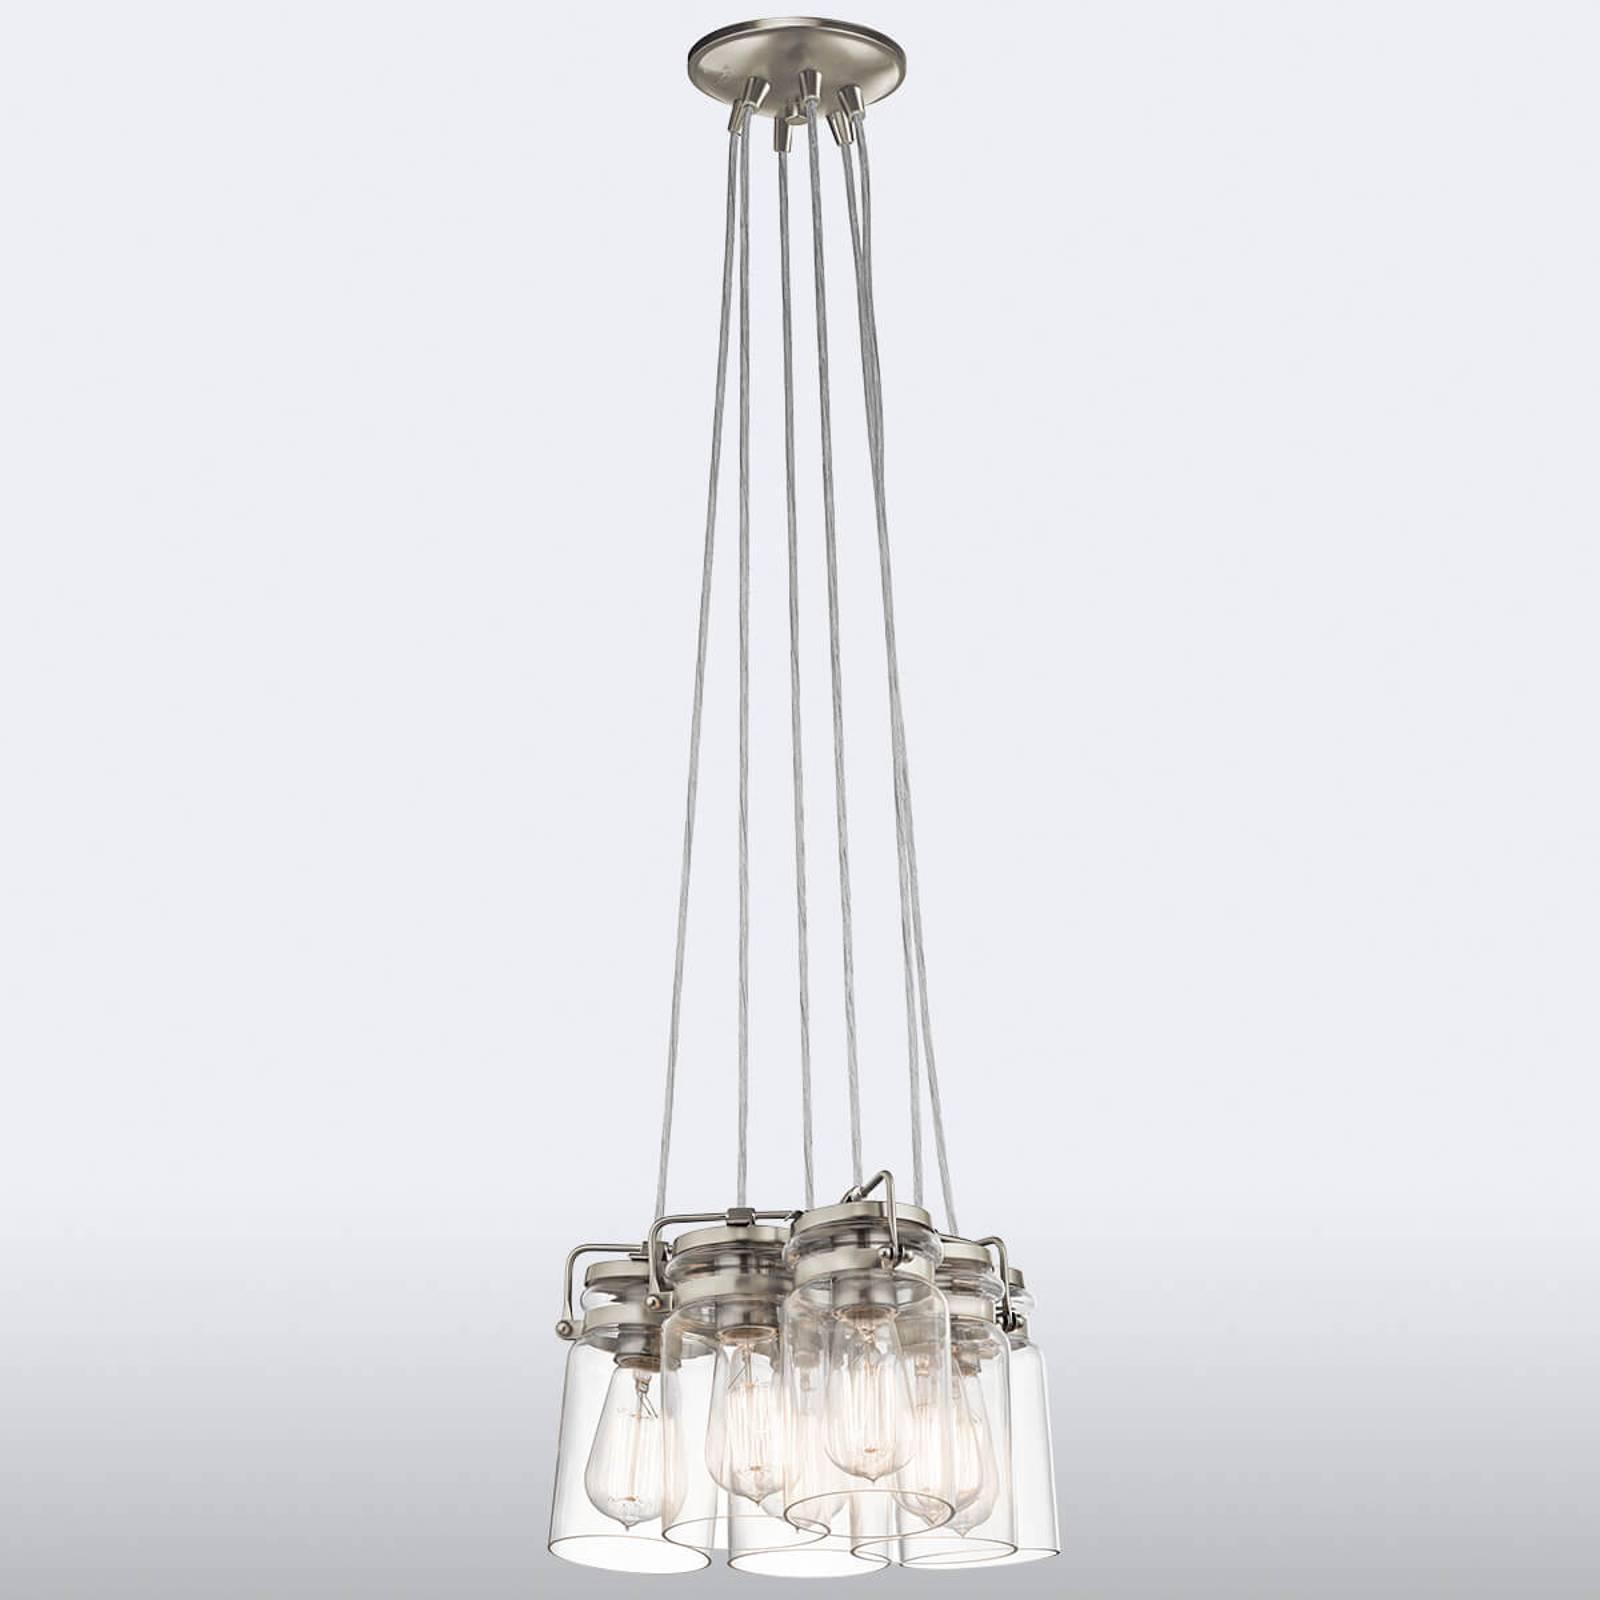 Gebundelde hanglamp Brinley 6-lamps